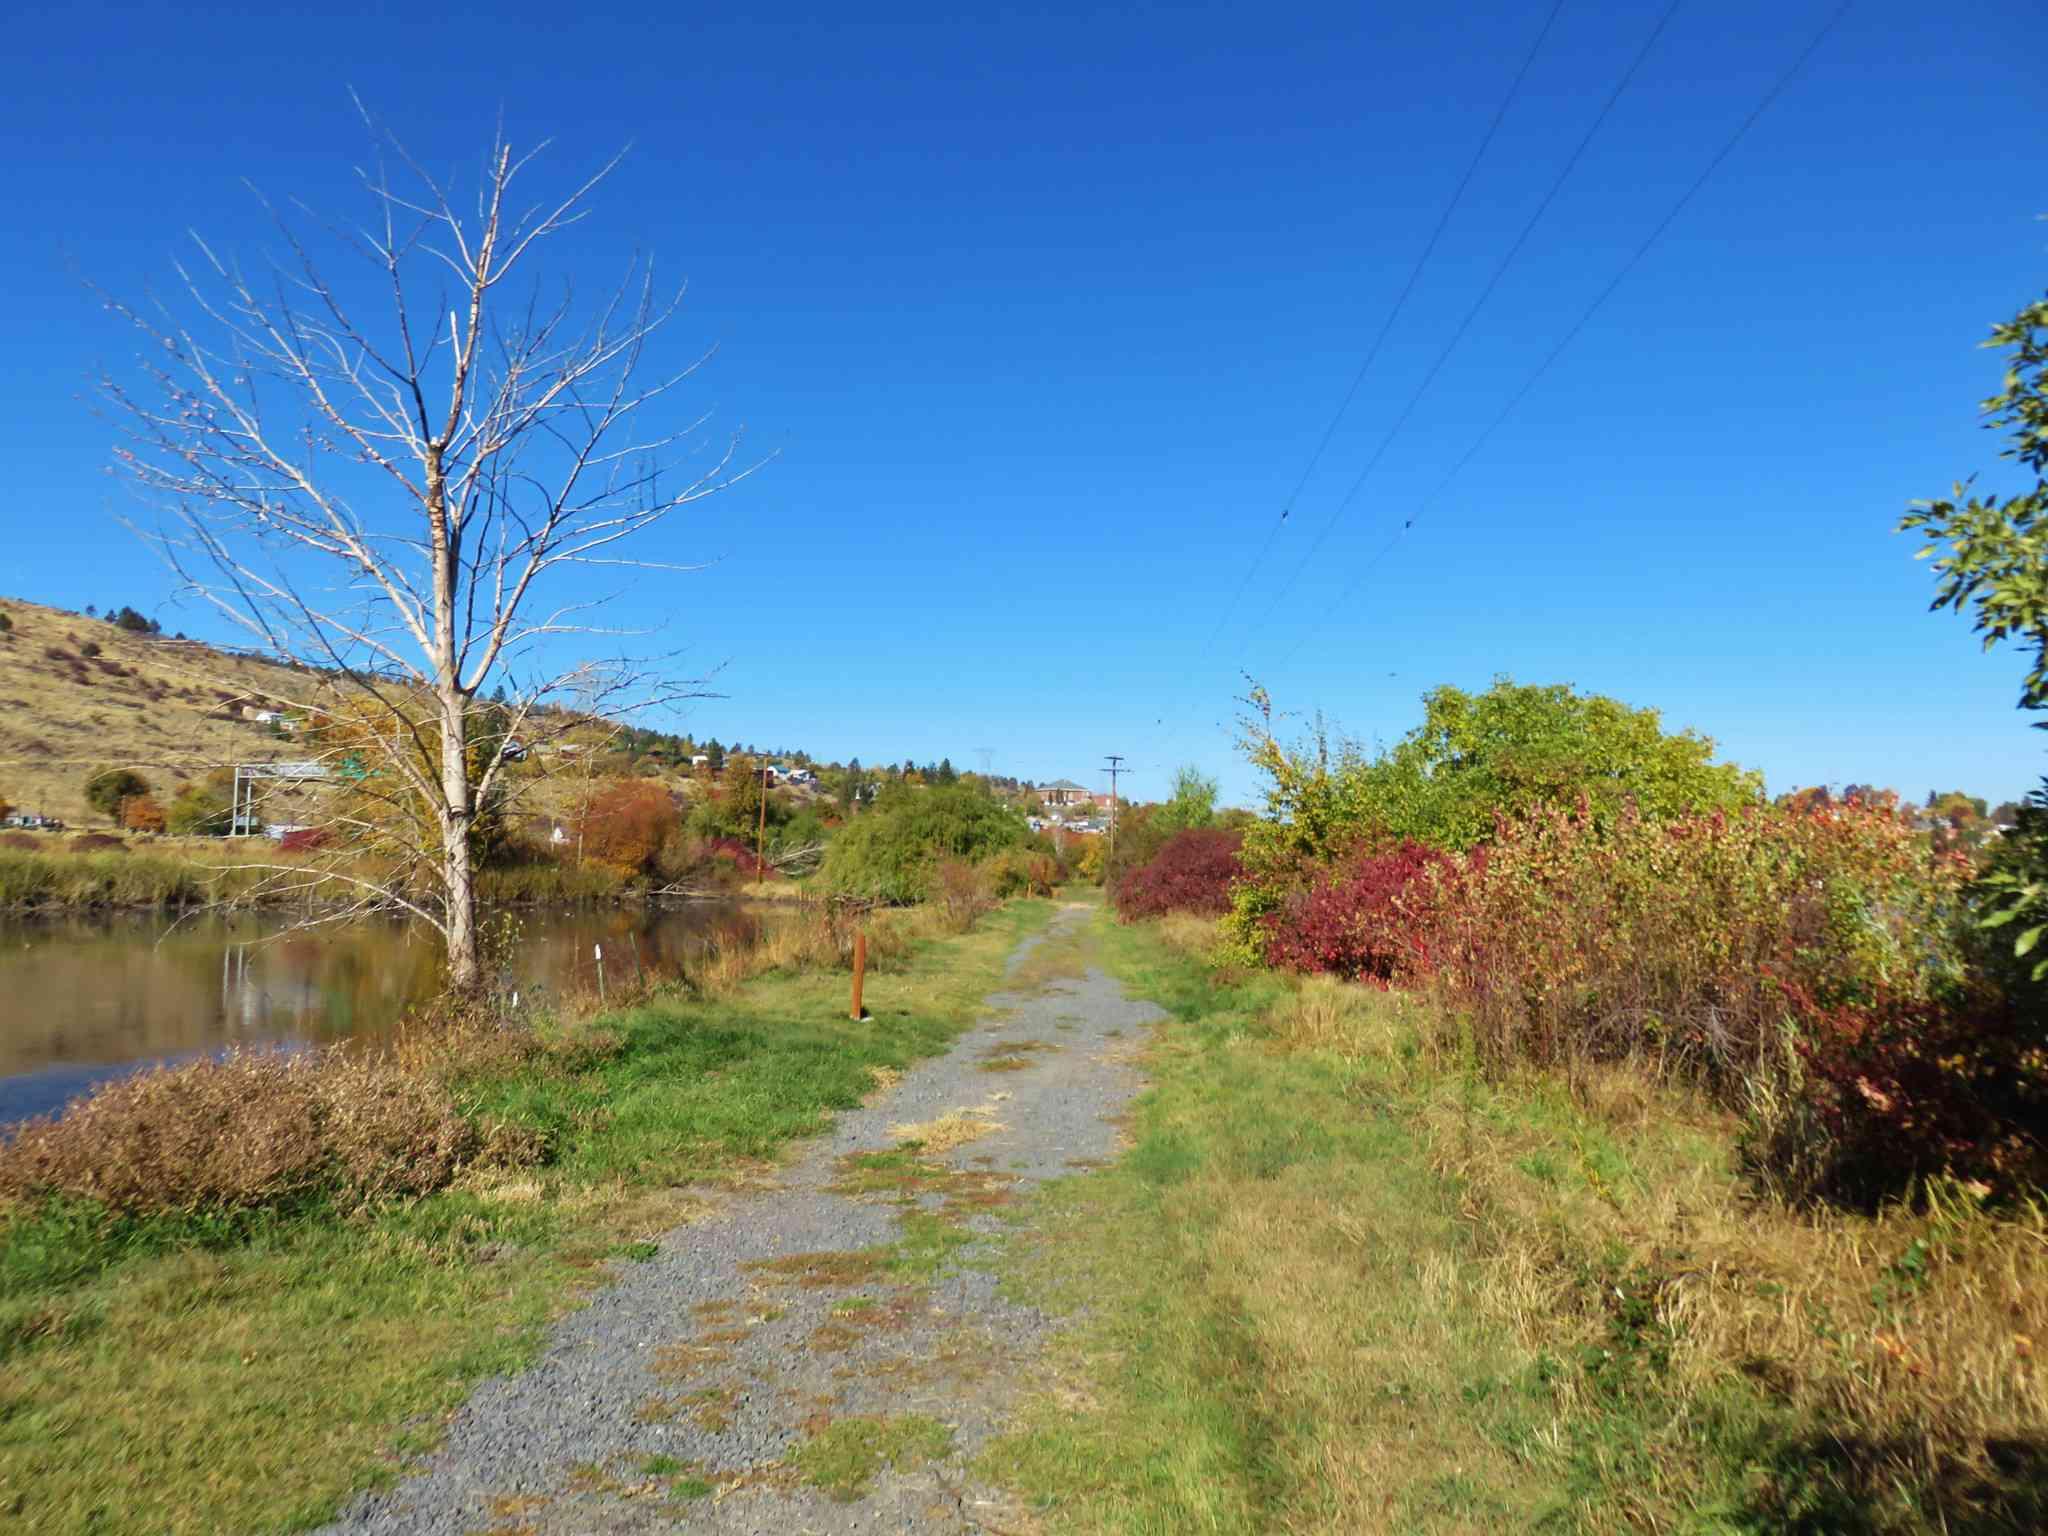 Wingwatchers Nature Trail